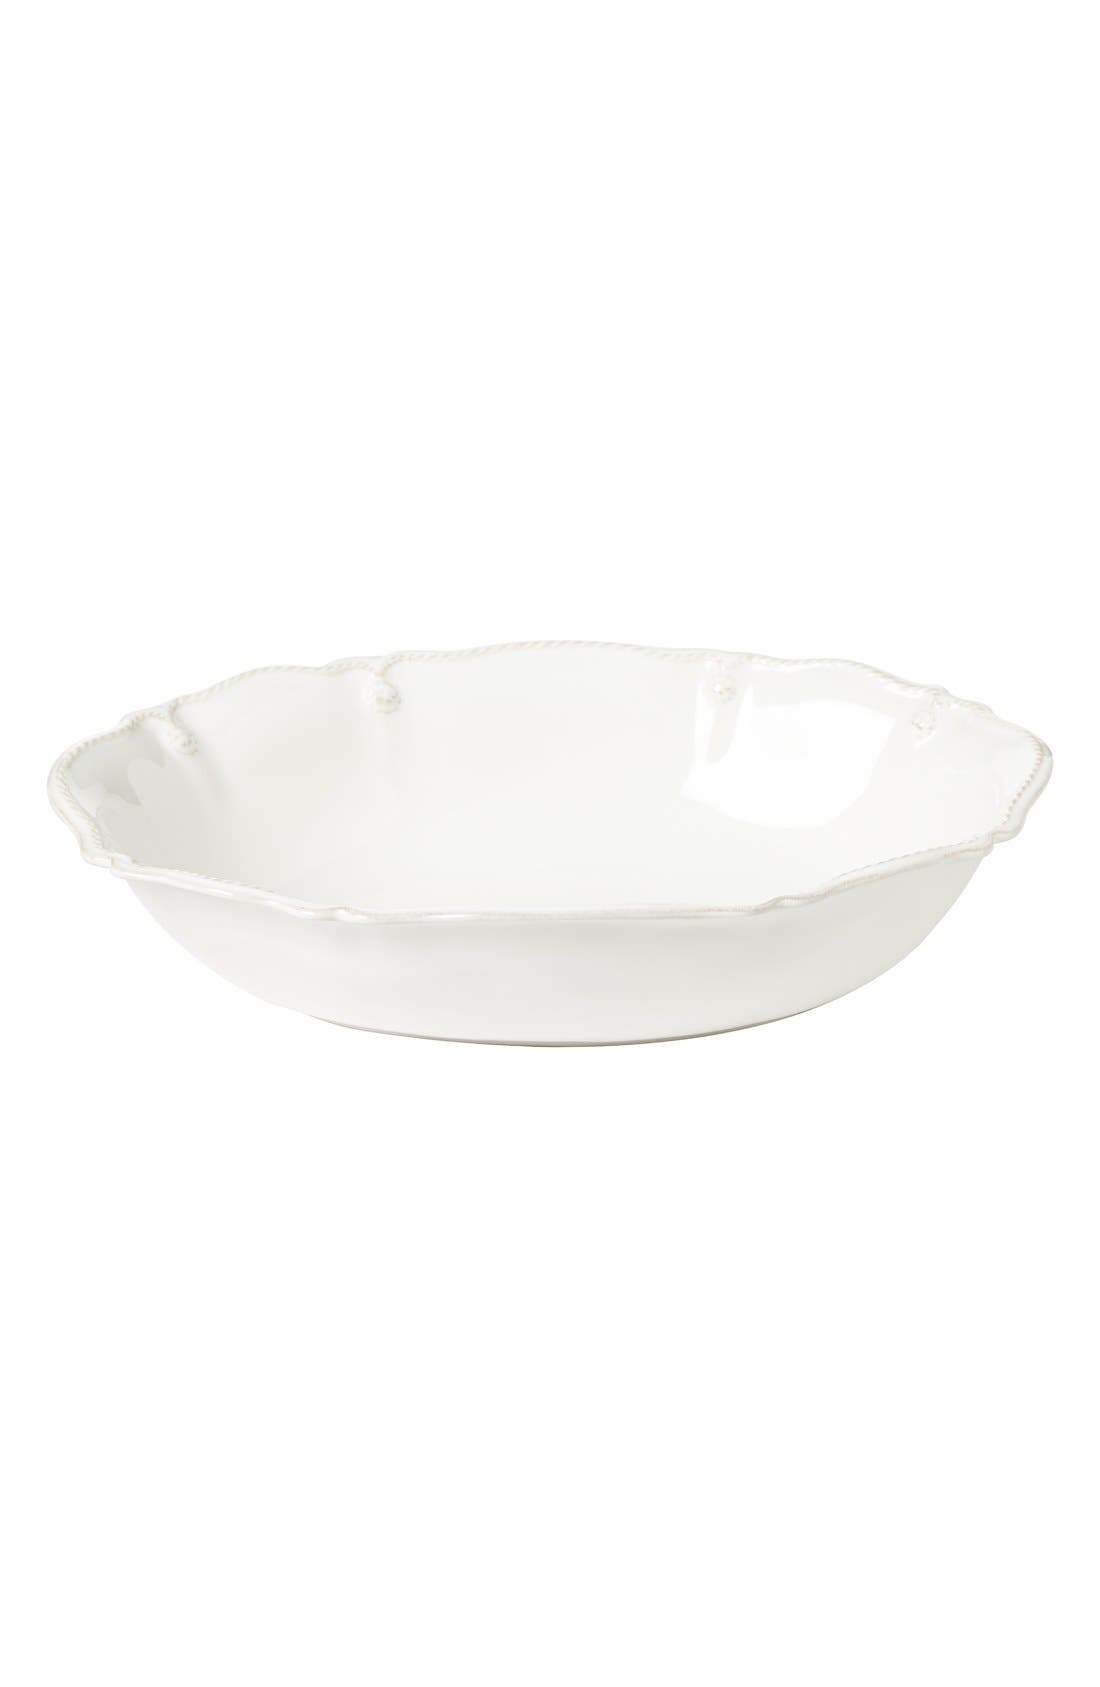 Main Image - Juliska 'Berry and Thread' OvalServing Bowl